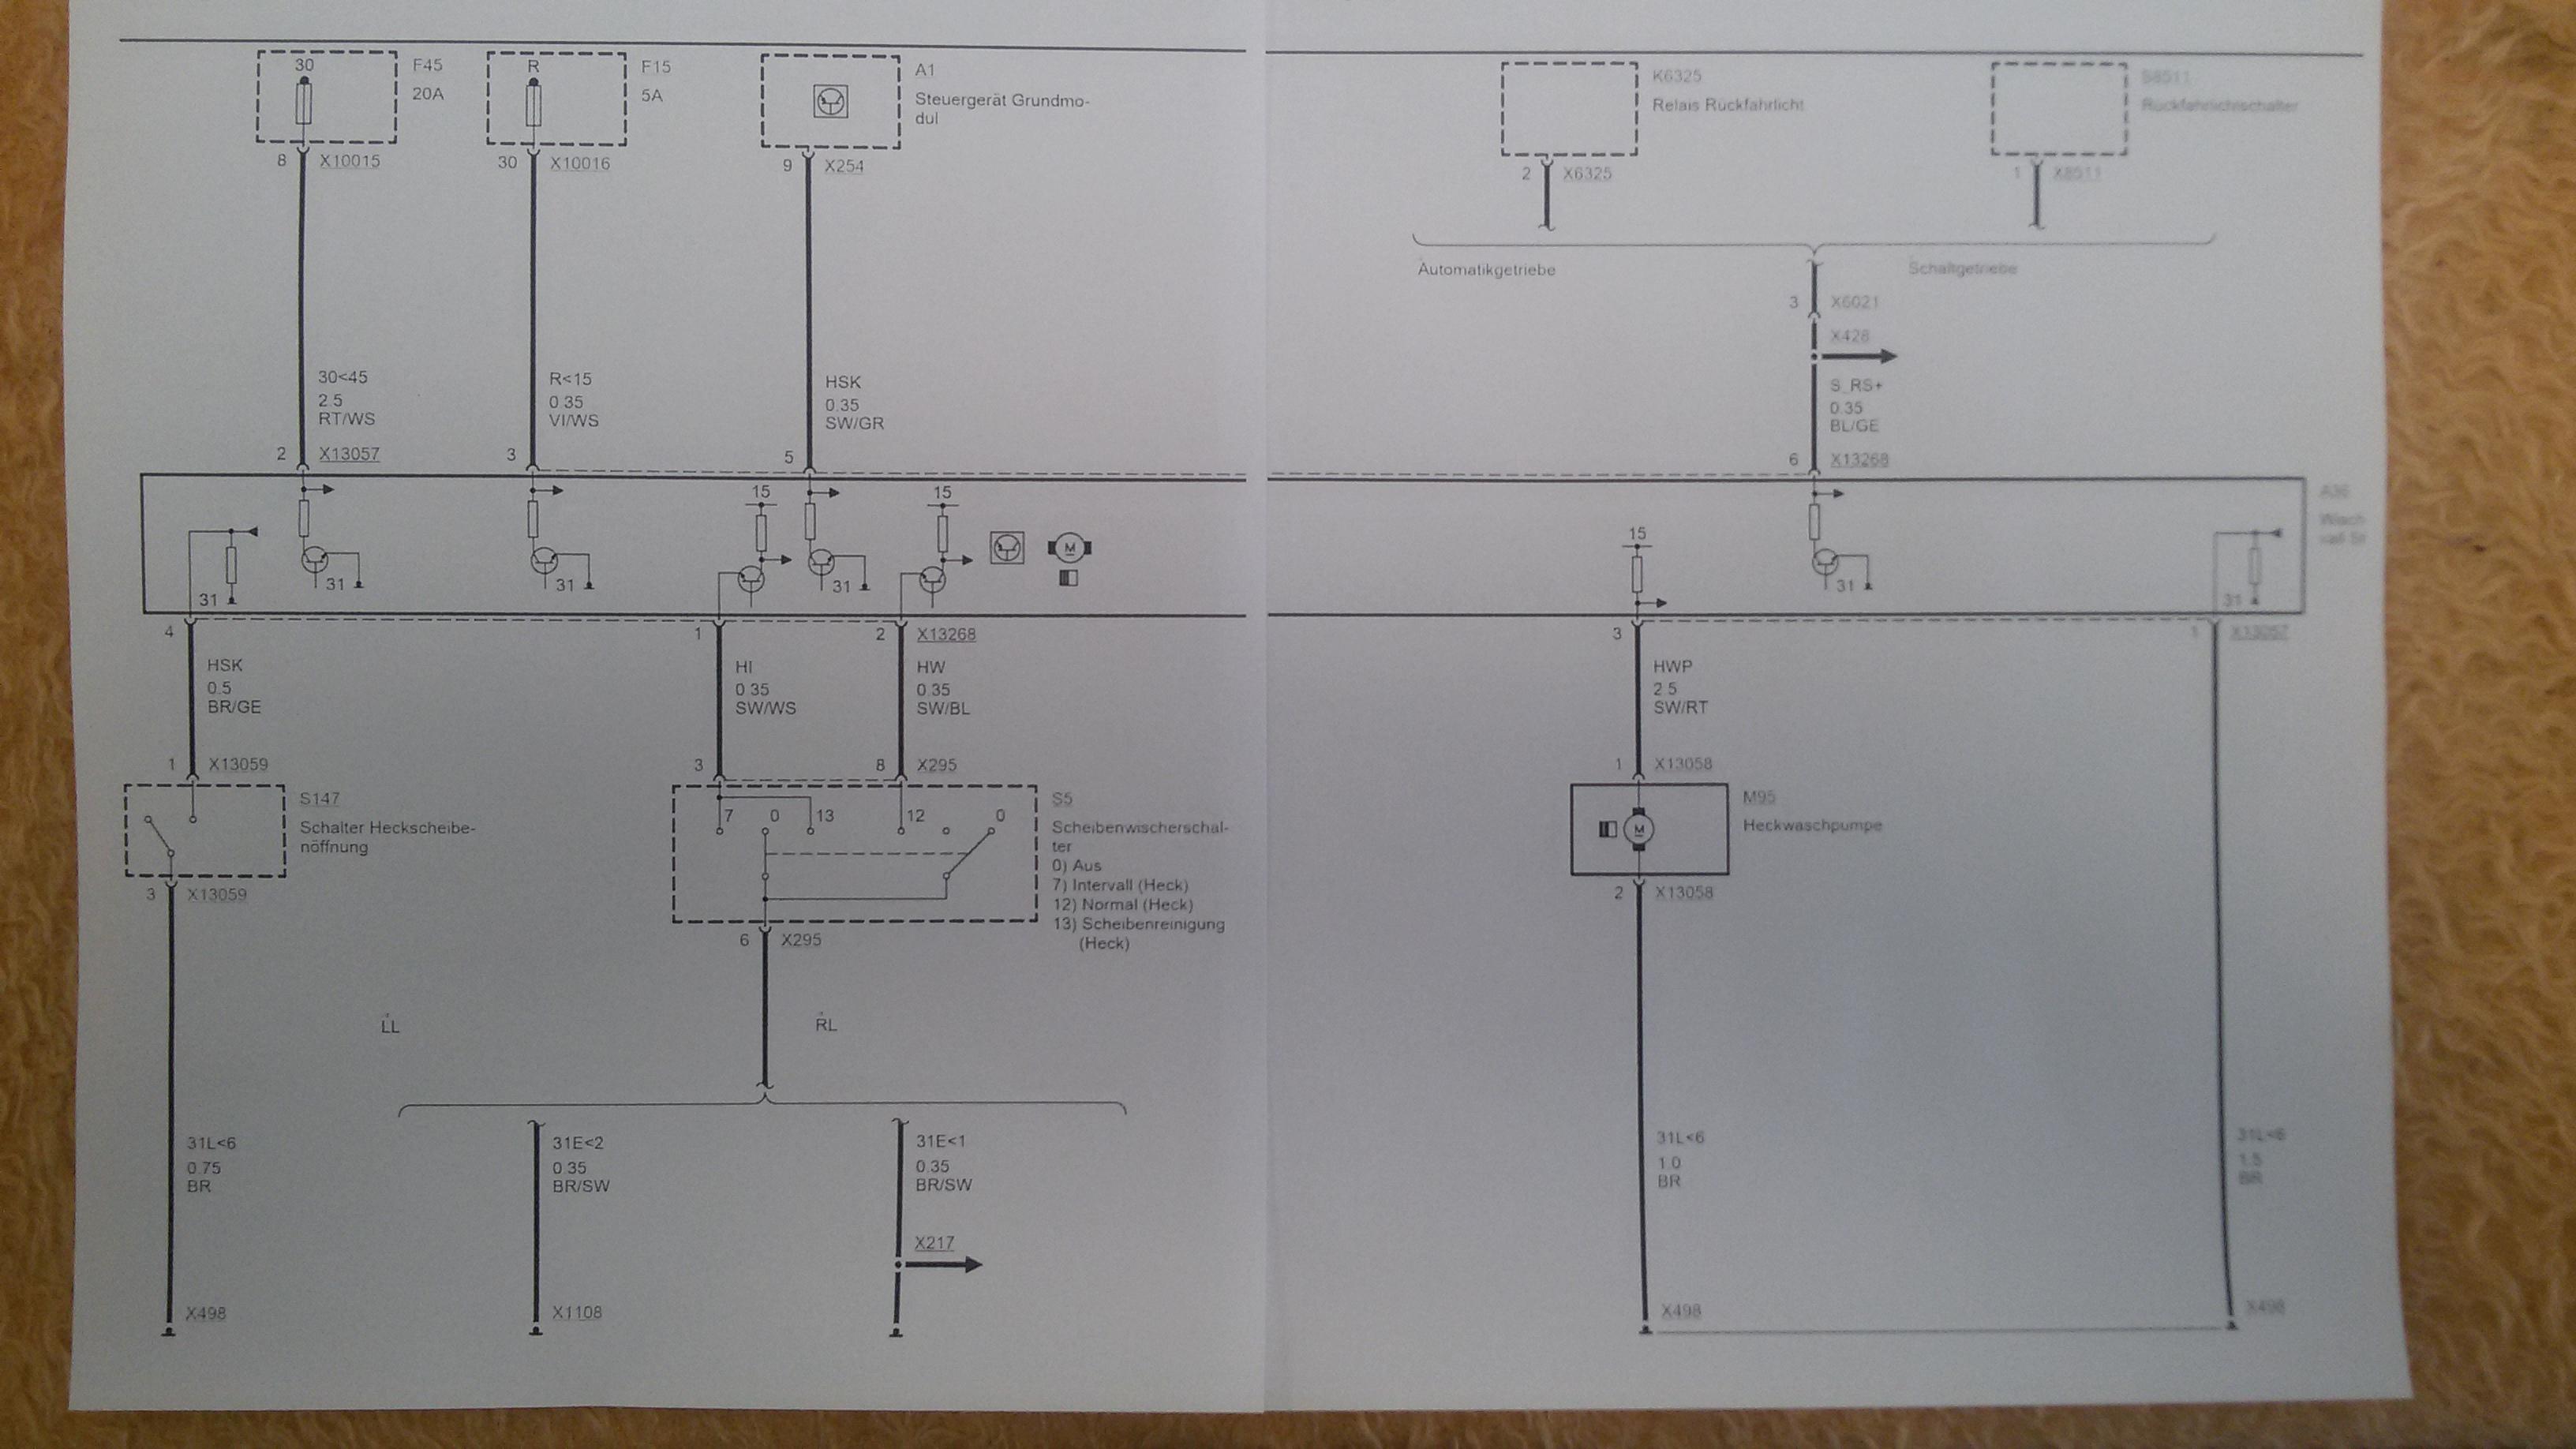 Großzügig Bmw X3 Schaltplan Fotos - Der Schaltplan - raydavisrealtor ...